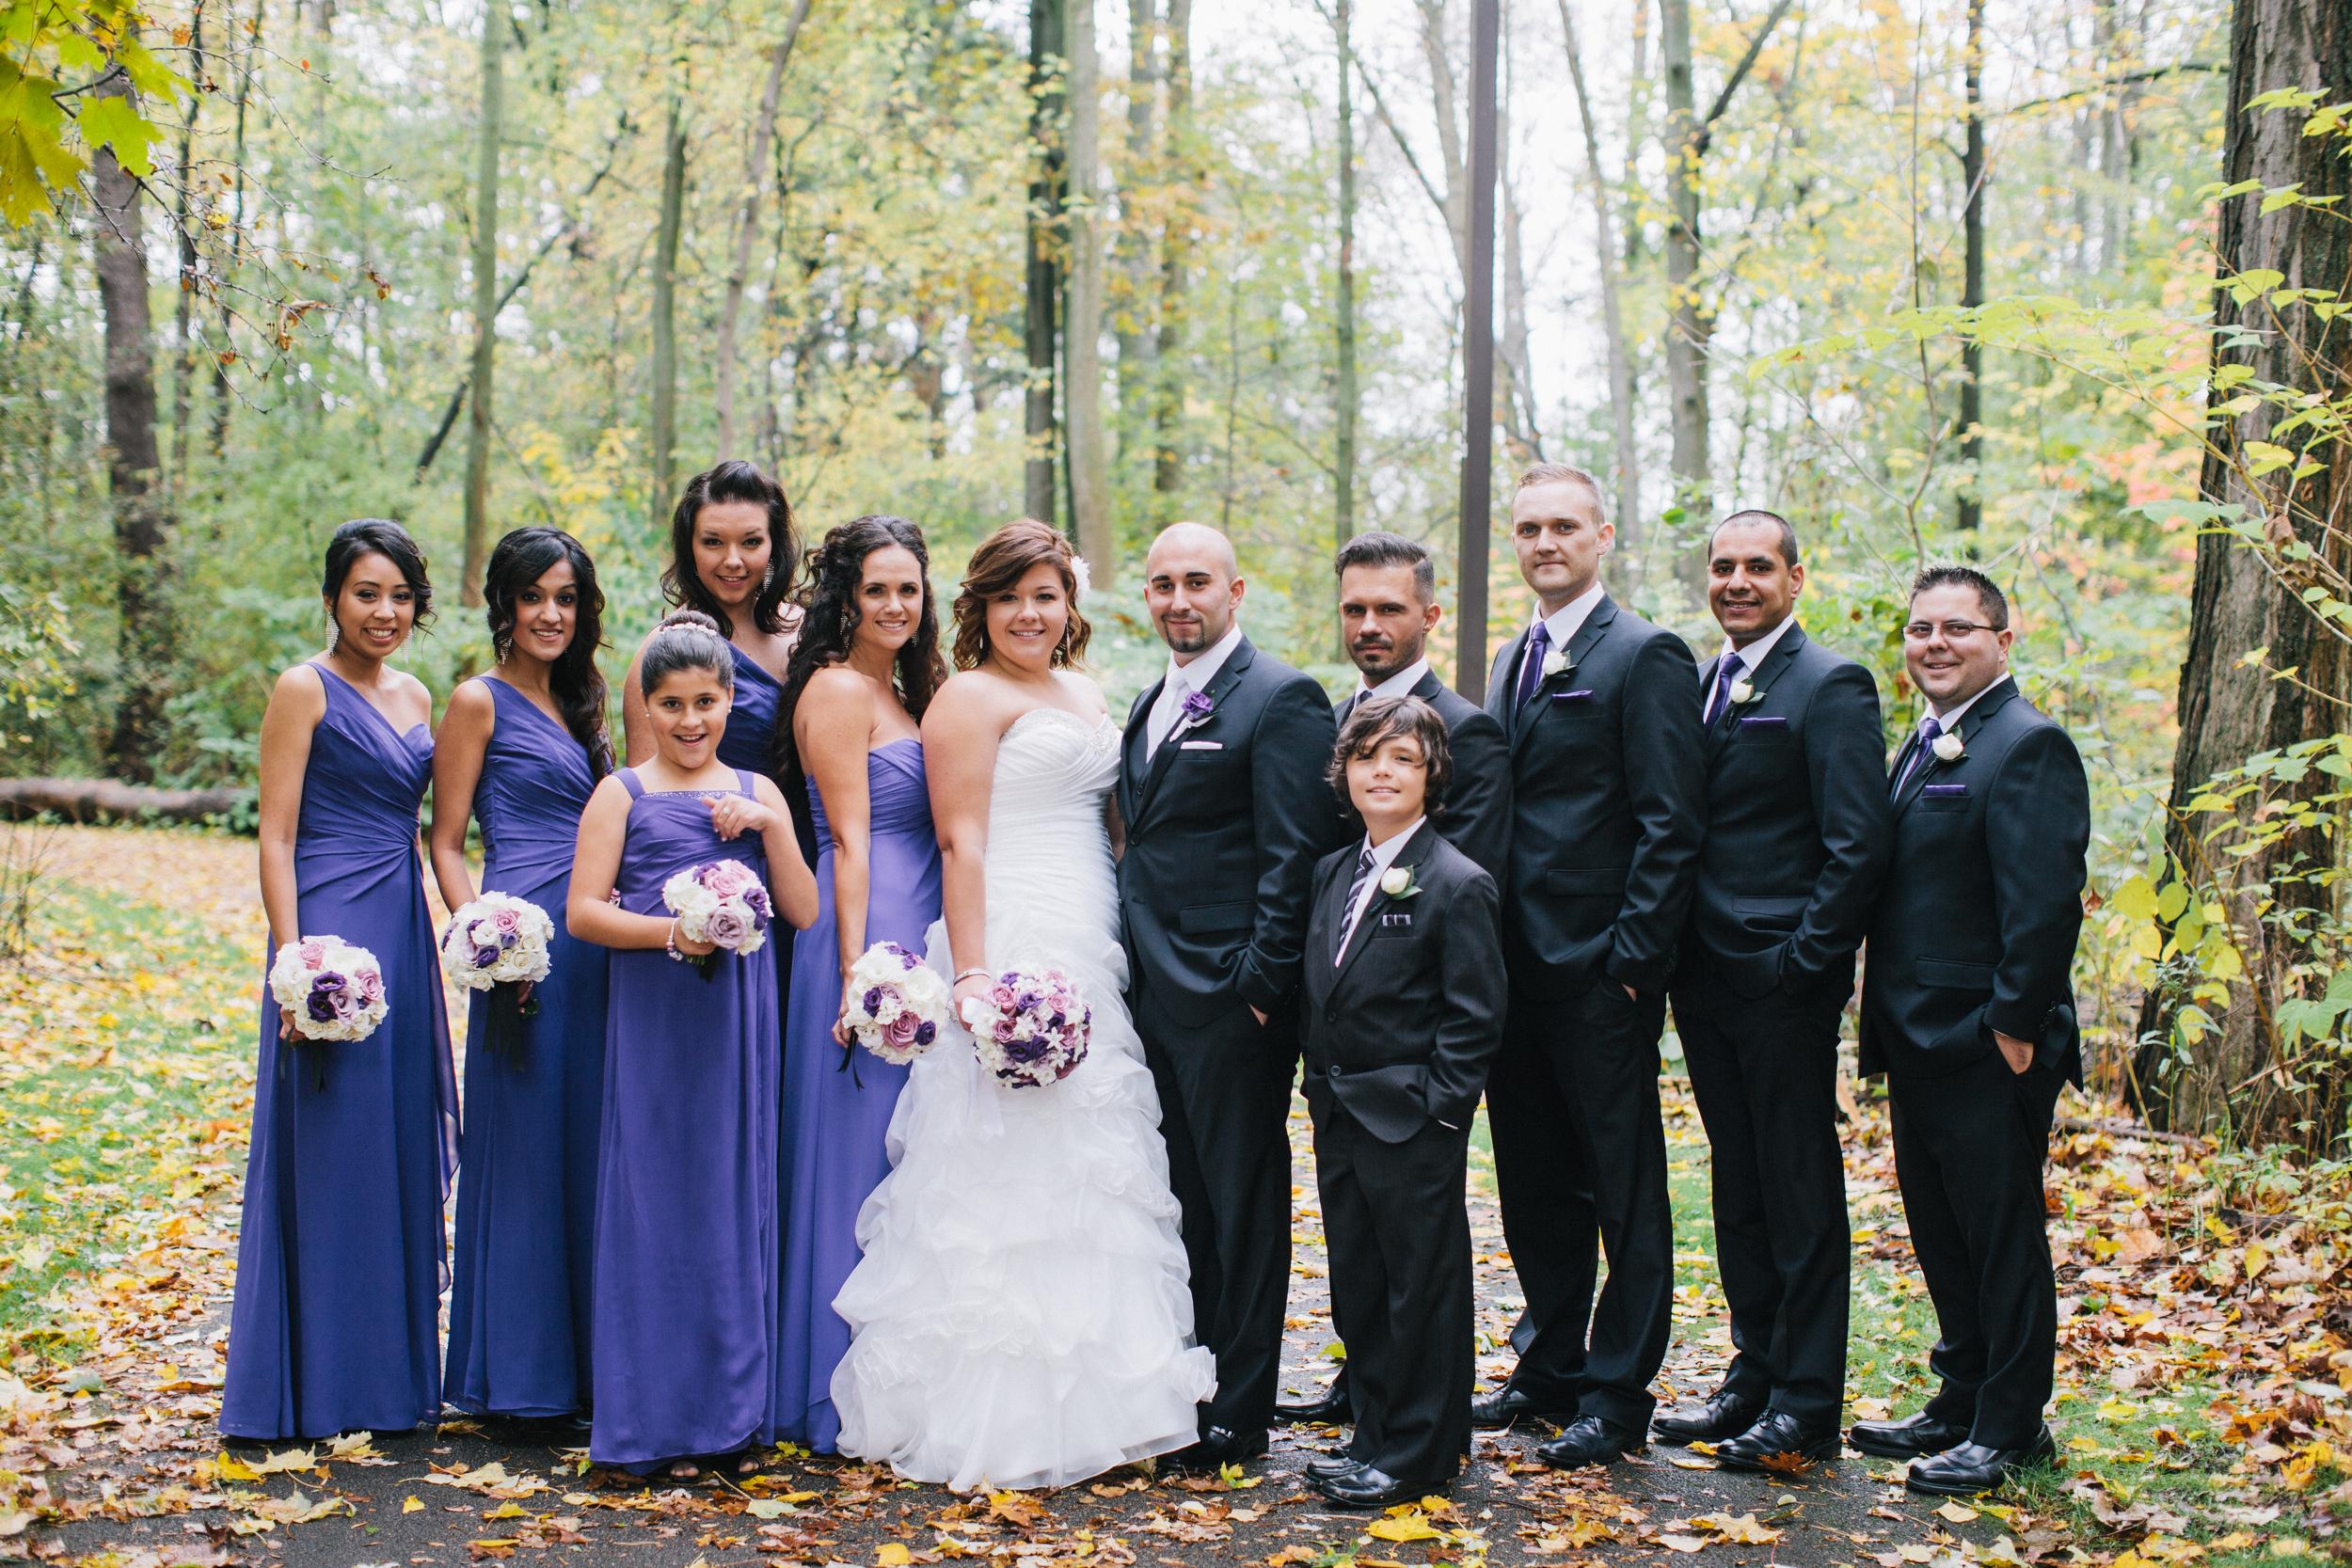 Stephanie-Kyle-paradise-banquet-hall-michael-rousseau-photography-best-toronto-wedding-photographer-documentary-wedding029.JPG